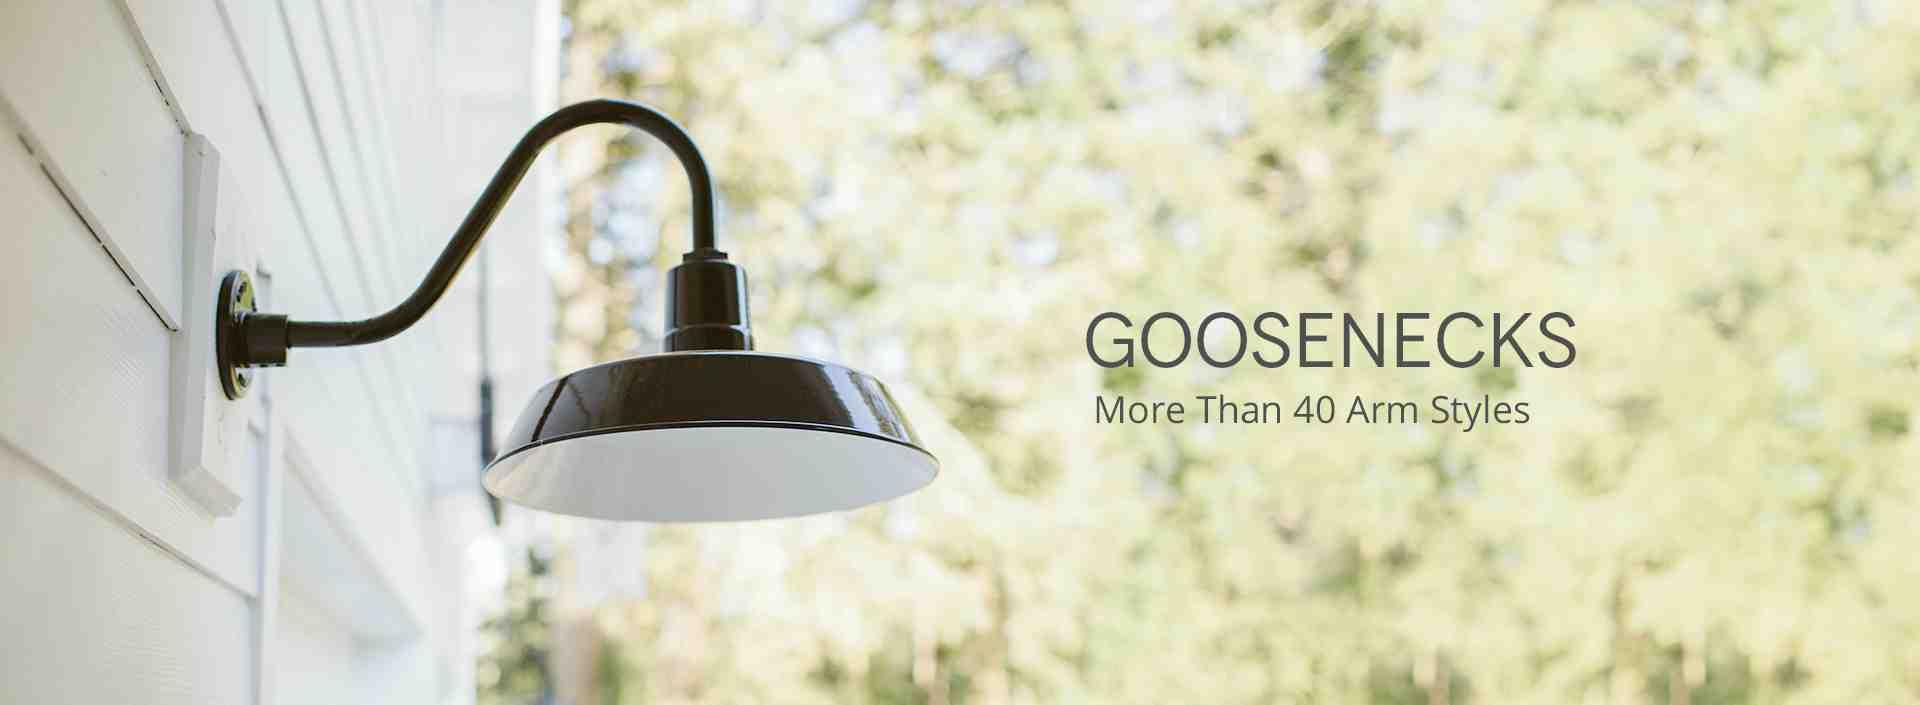 Goosenecks